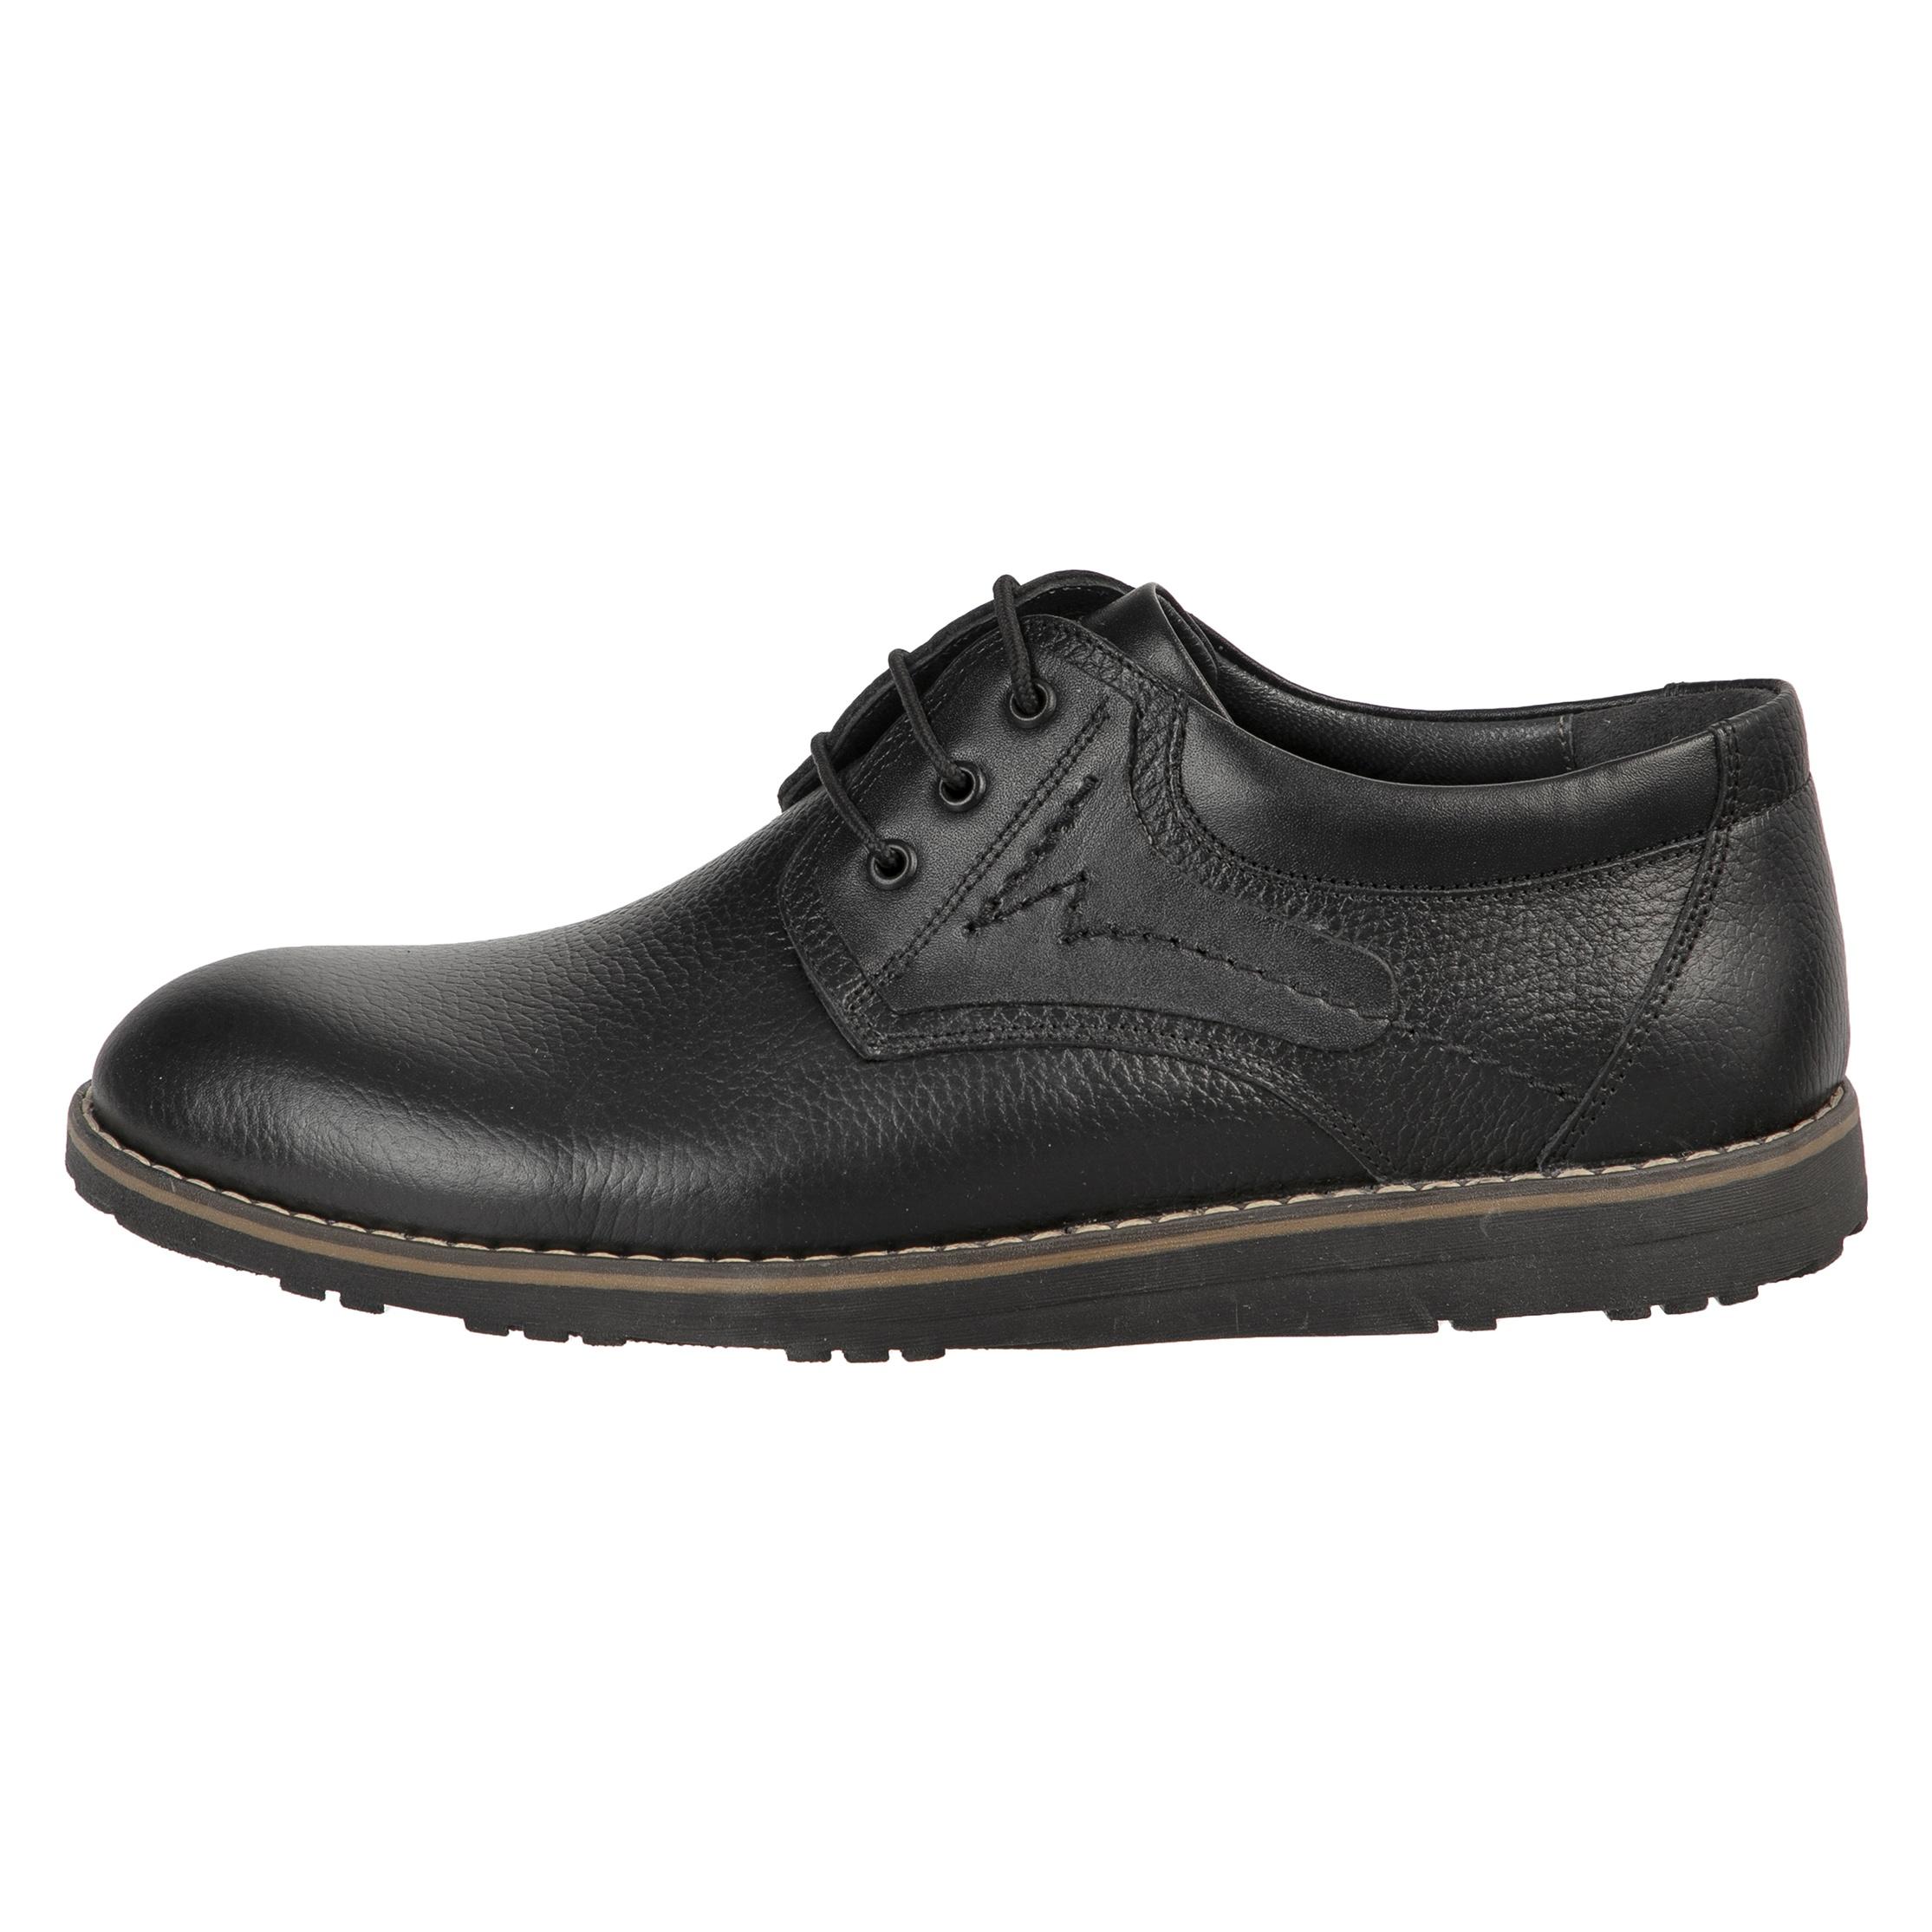 کفش روزمره مردانه دانادل مدل 7001m503101